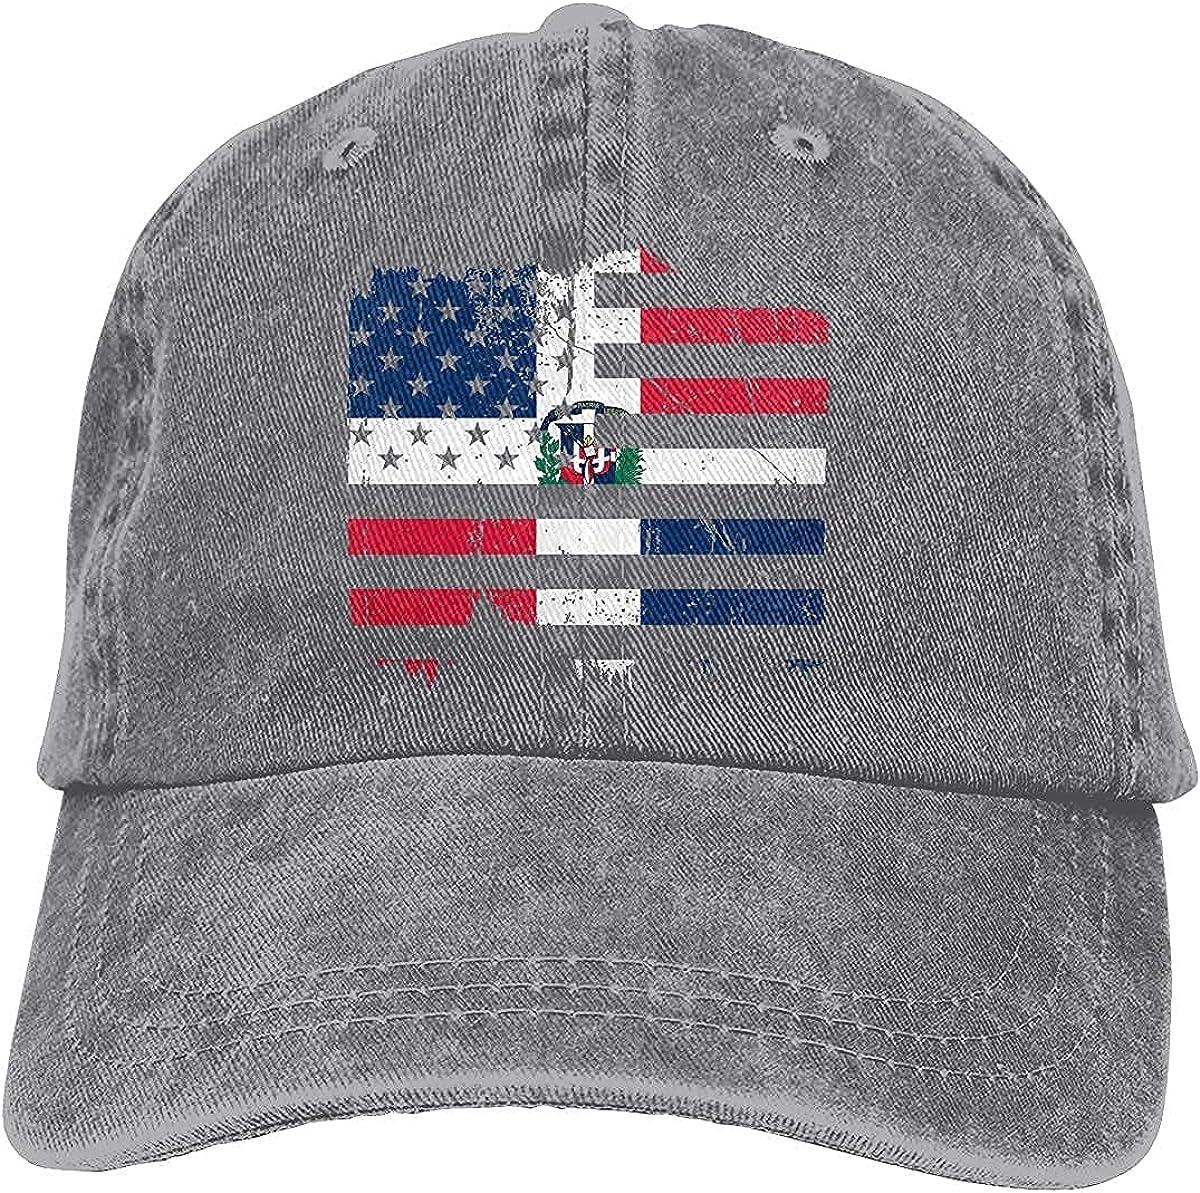 Distressed American Dominican Republic Flag Baseball Cap, Adjustable Size Dad Hat, Vintage Baseball Hats for Men Woman